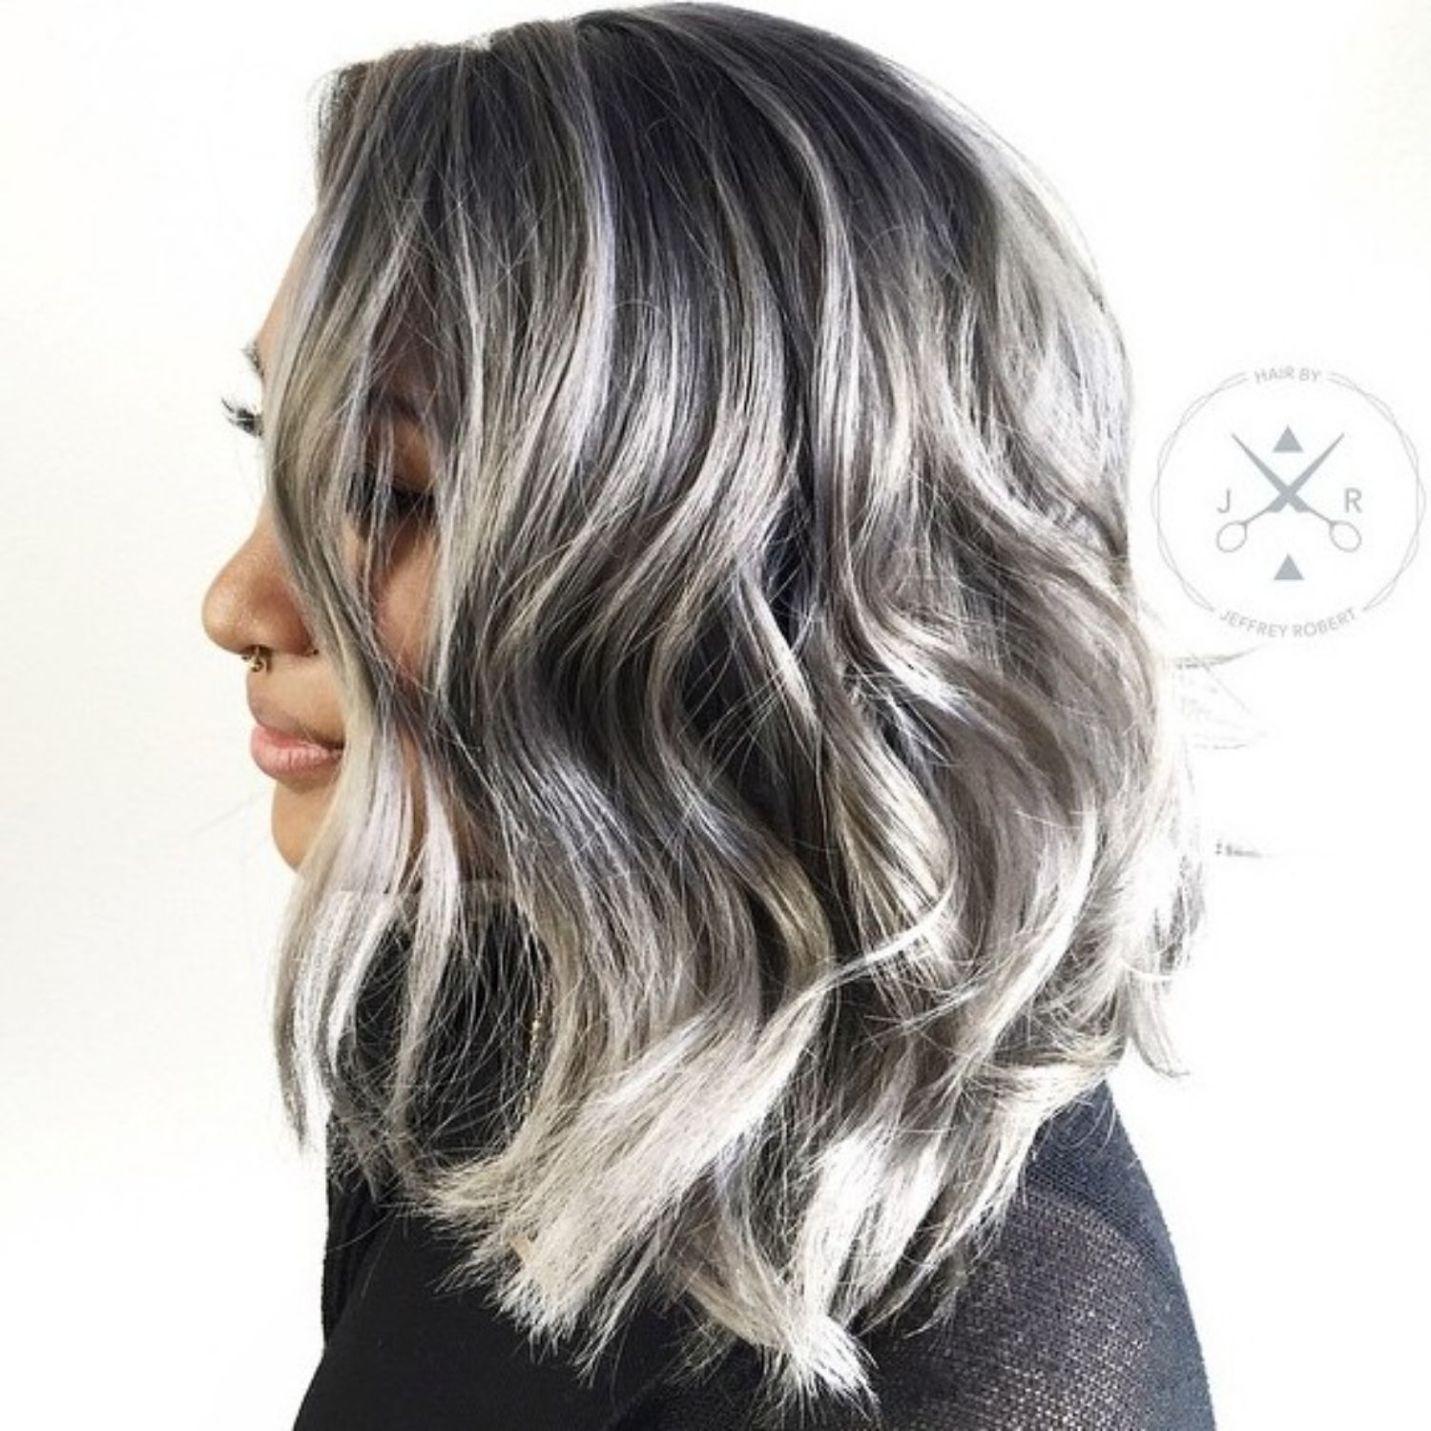 Contrast Medium Black Hair Black Hair With Highlights Brown Hair With Silver Highlights